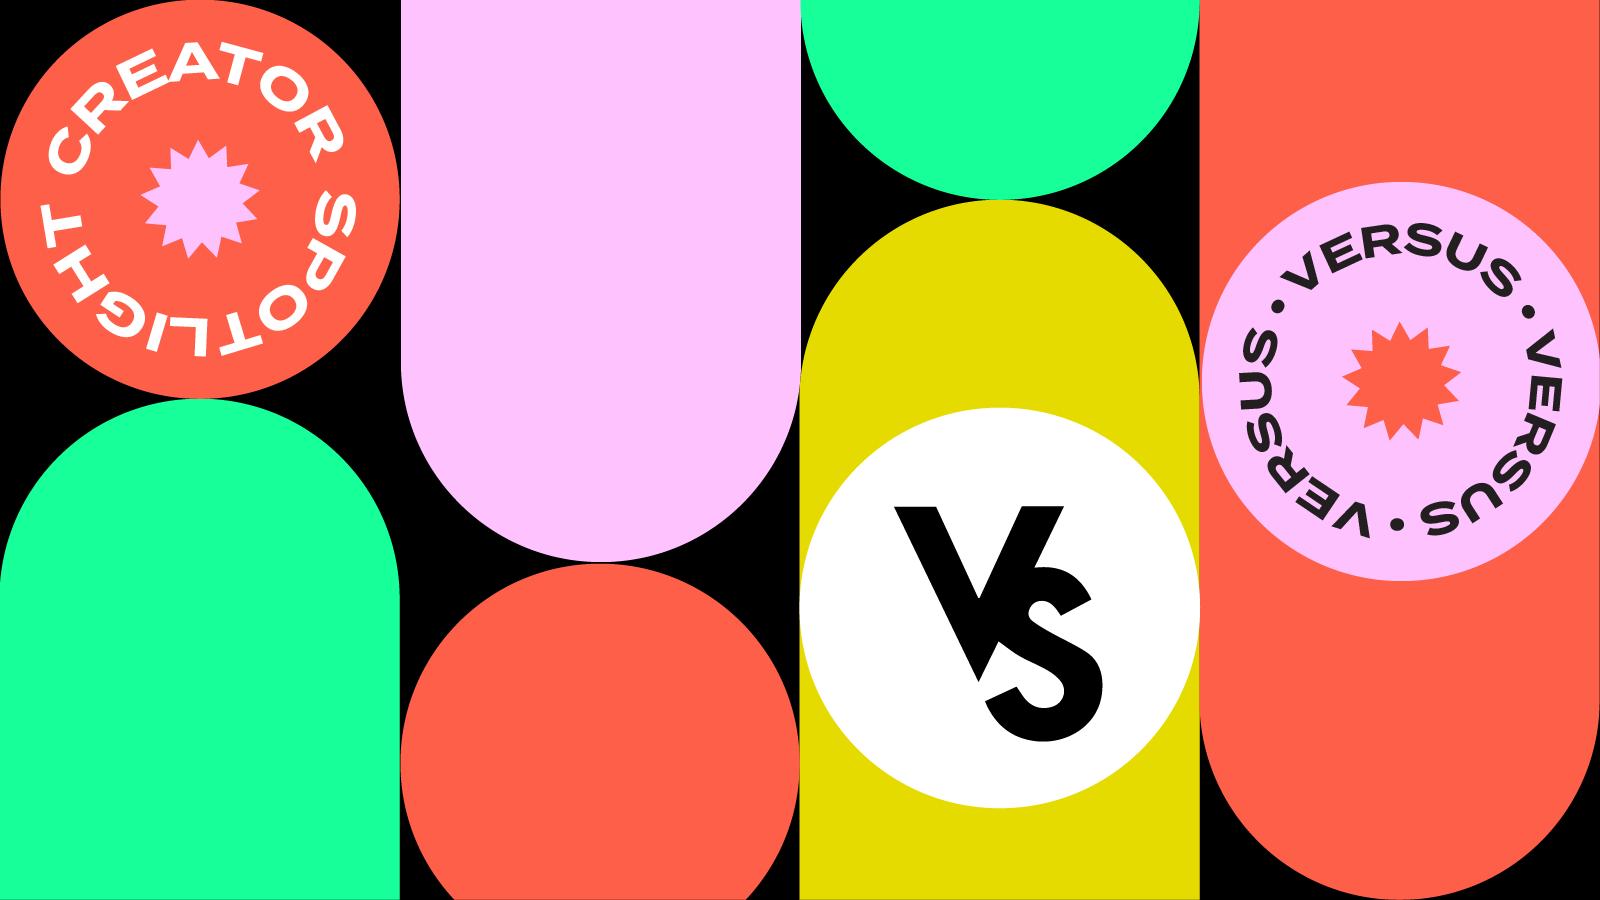 Partner Spotlight: Versus - Novel Auction Model for Creators